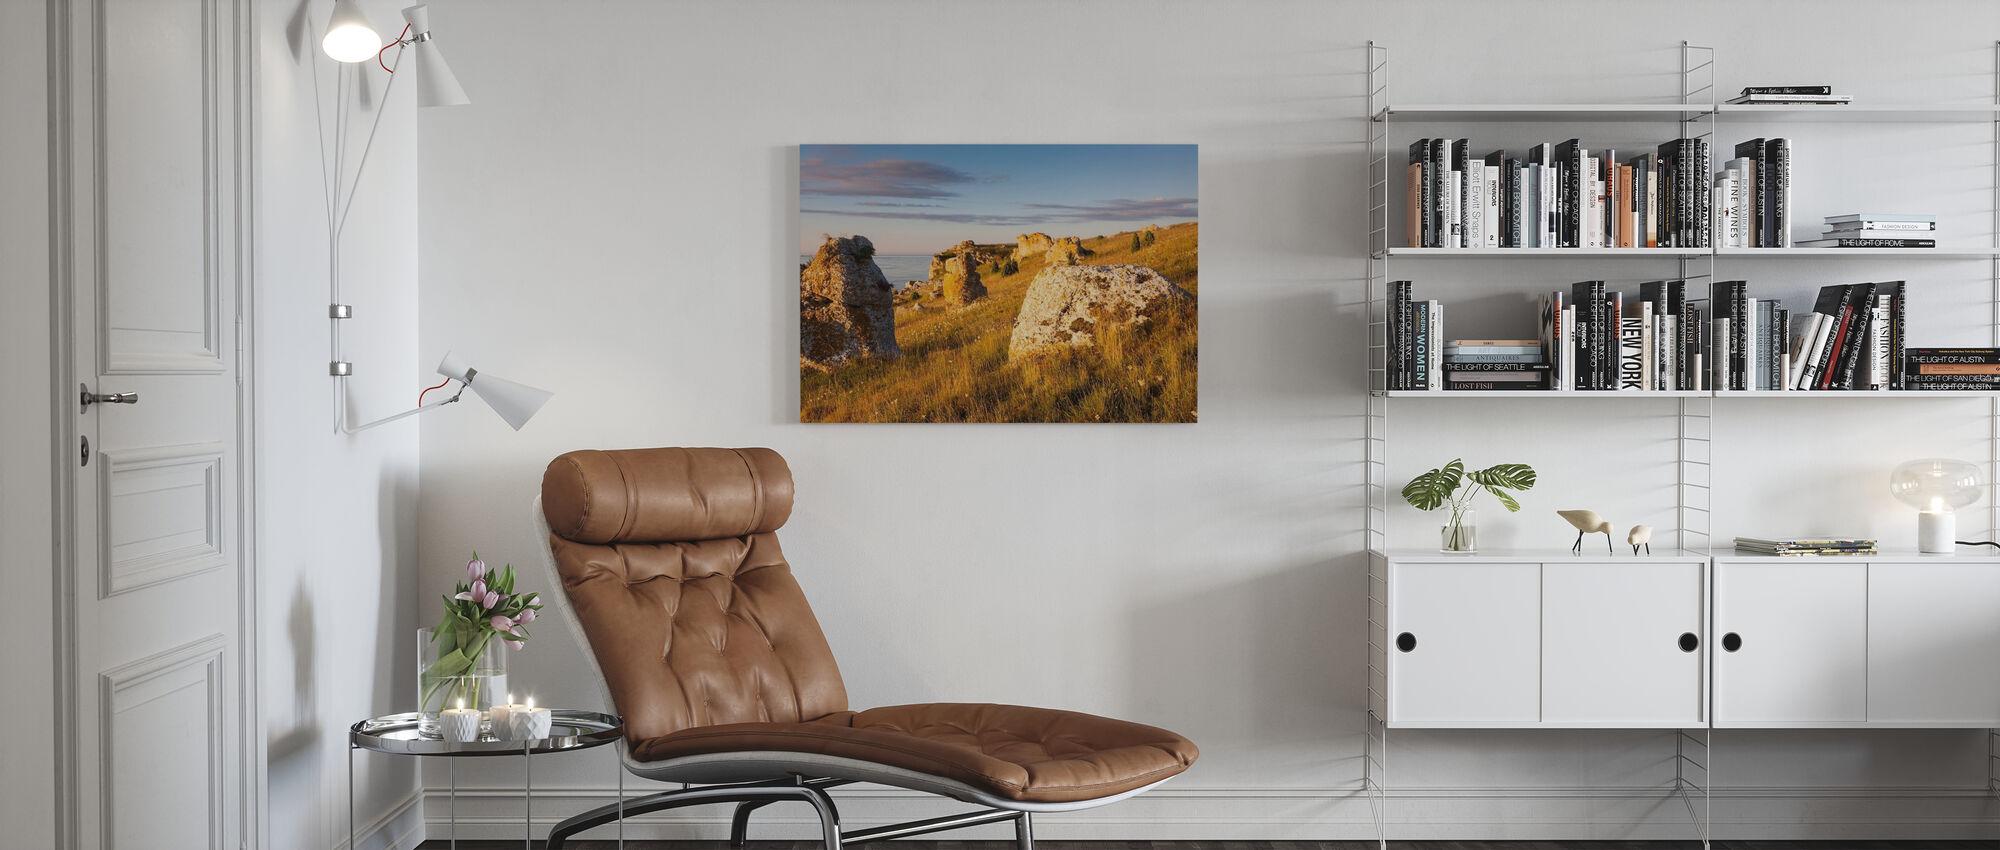 Mooi licht over de zee stapels - Canvas print - Woonkamer